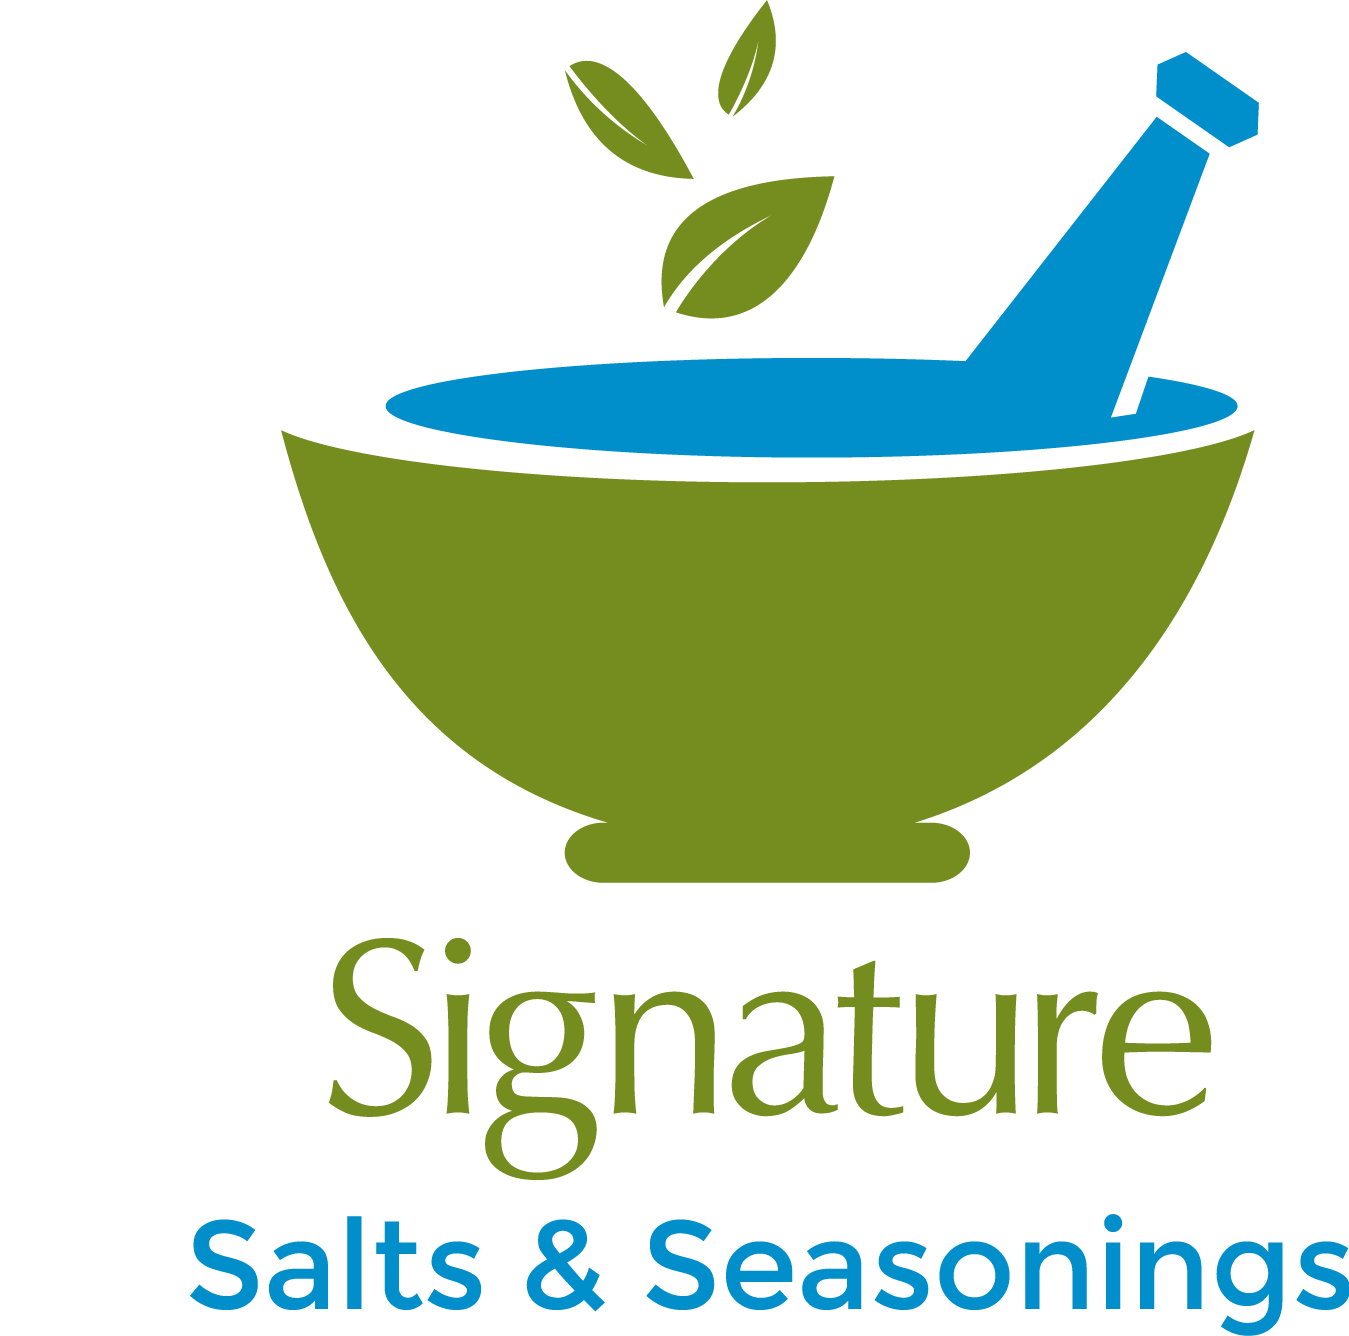 Signature Salts and Seasonings